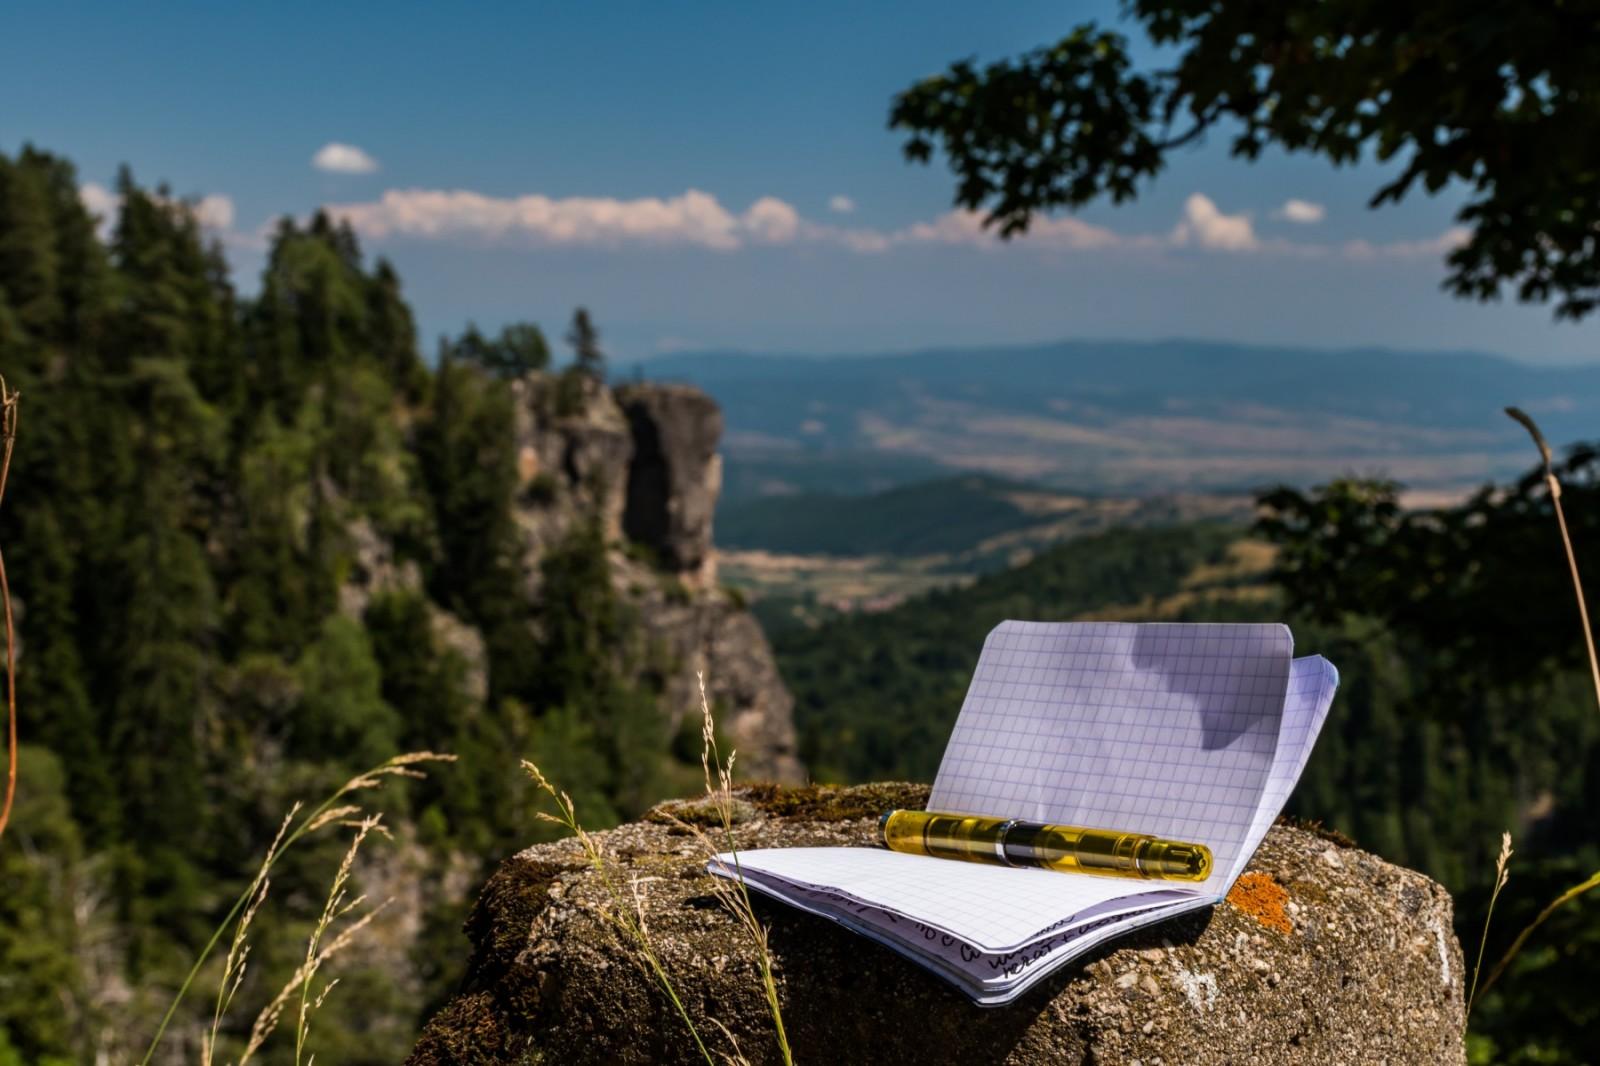 Rhodia Classic A7 notebook and Pelikan M205 DUO pen in Borovetz, Bulgaria